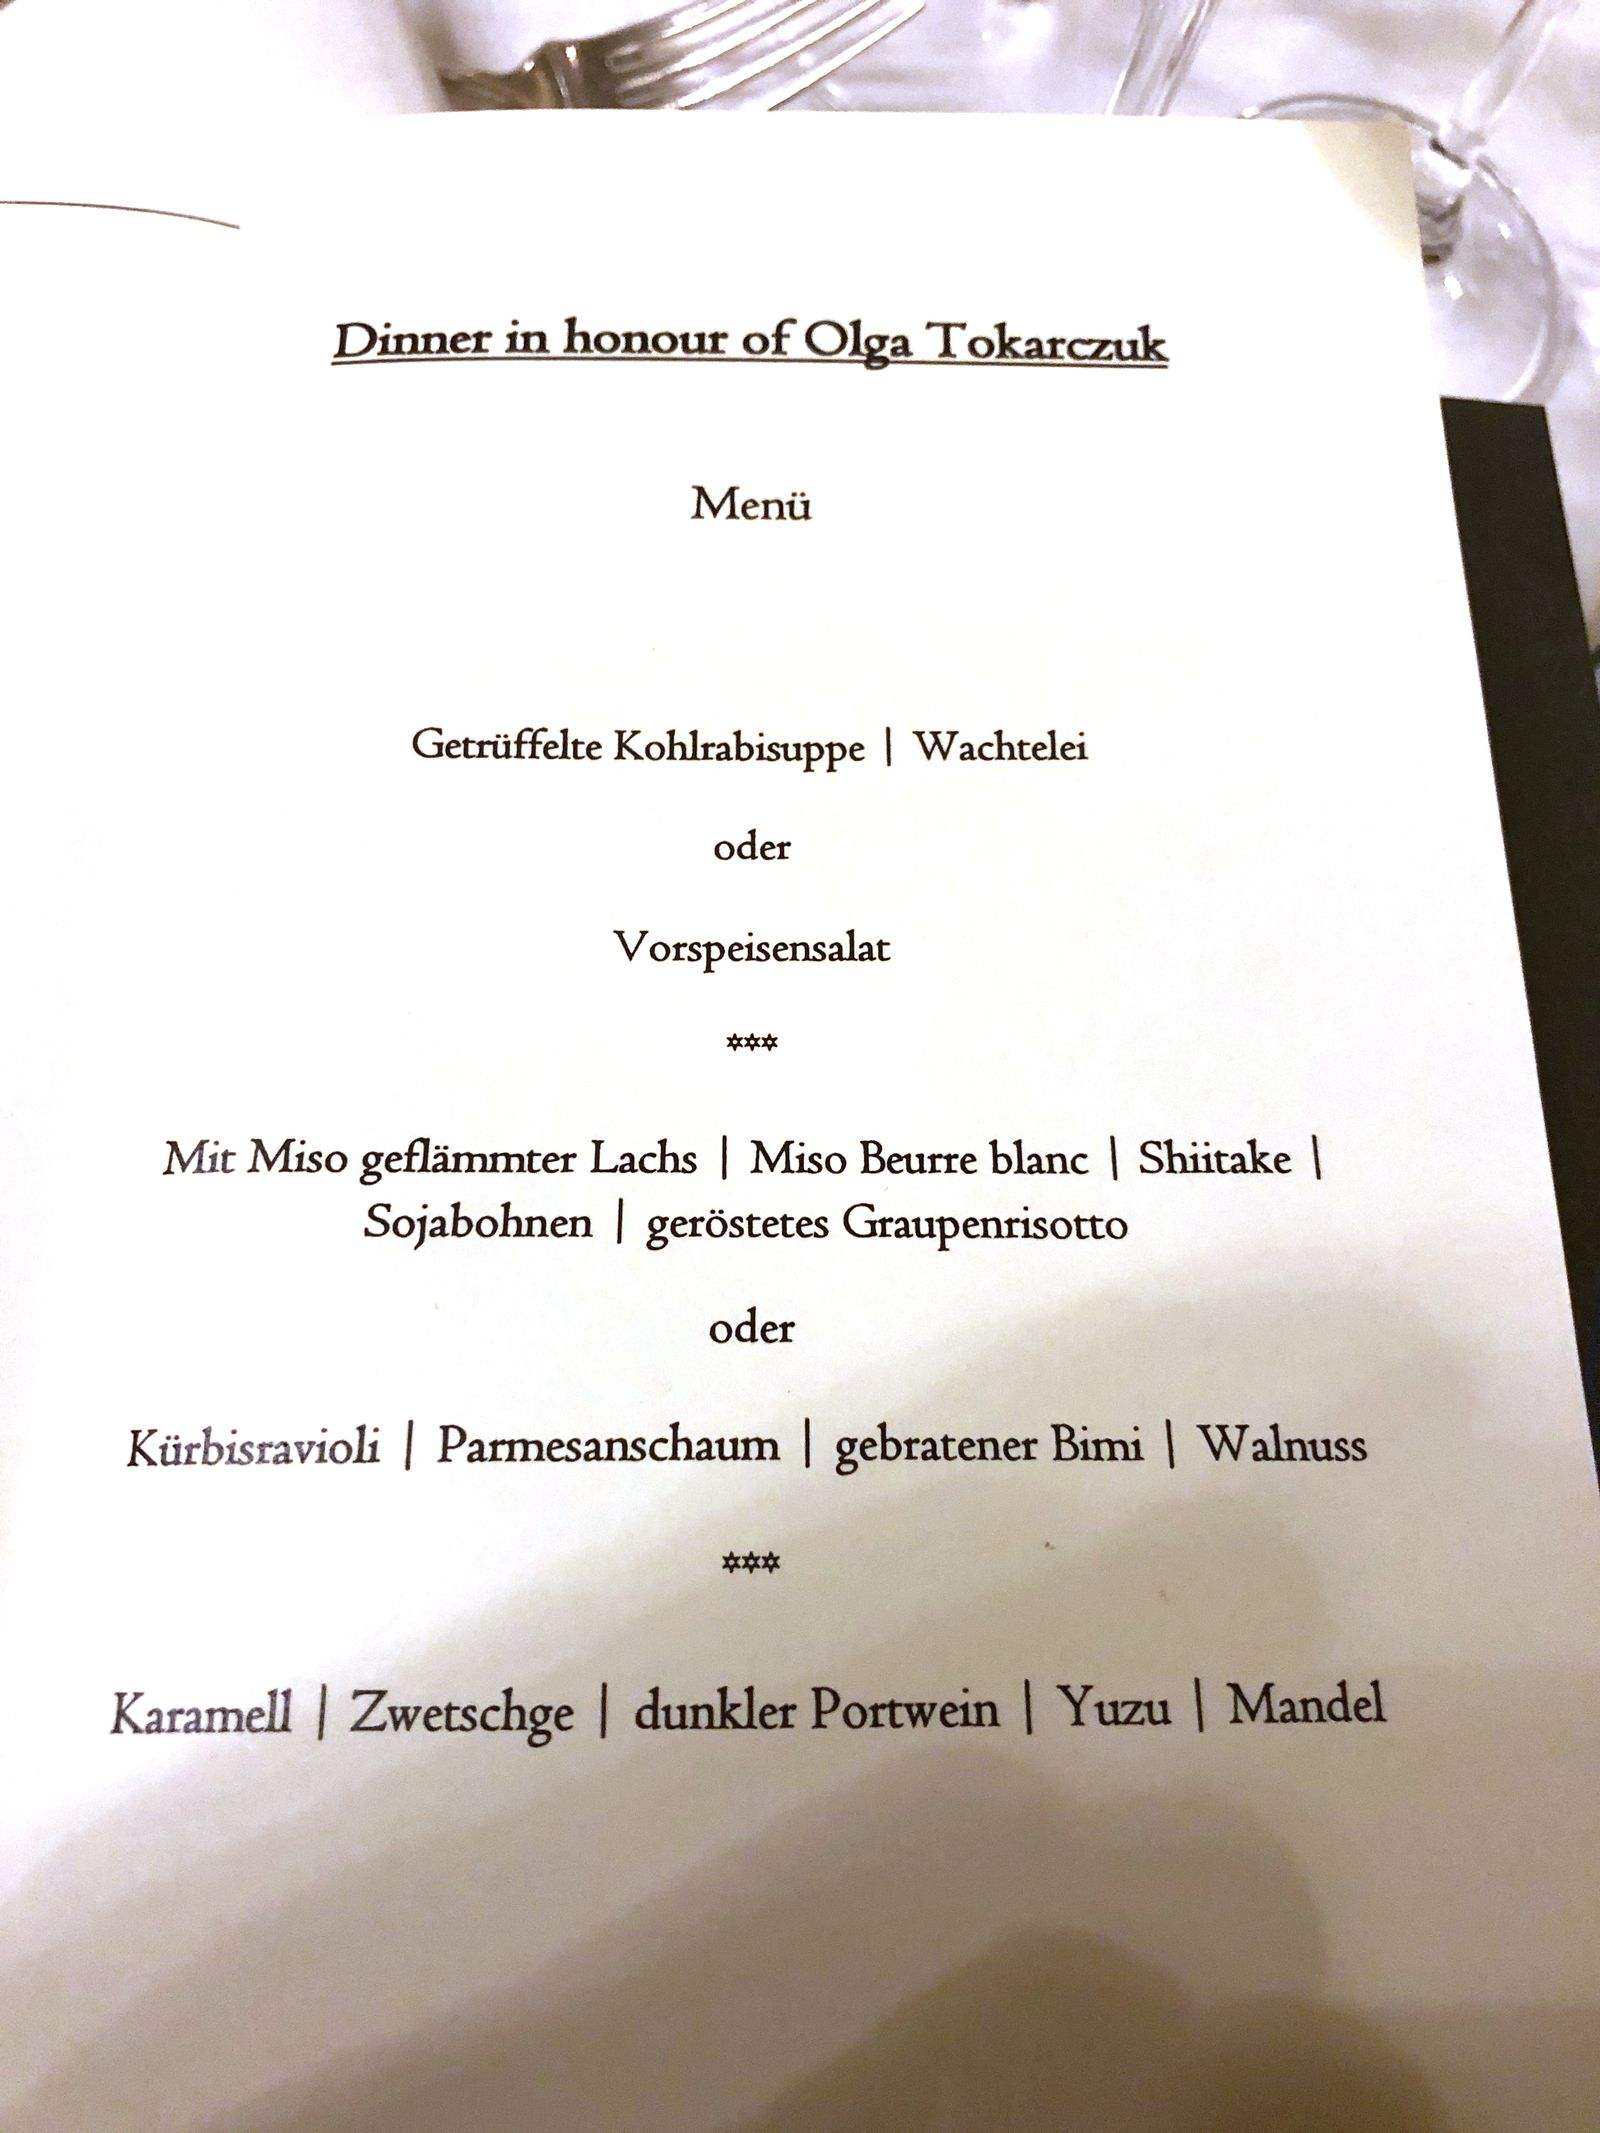 EINMALIGE VERWENDUNG/ Nobelpreis-Dinner